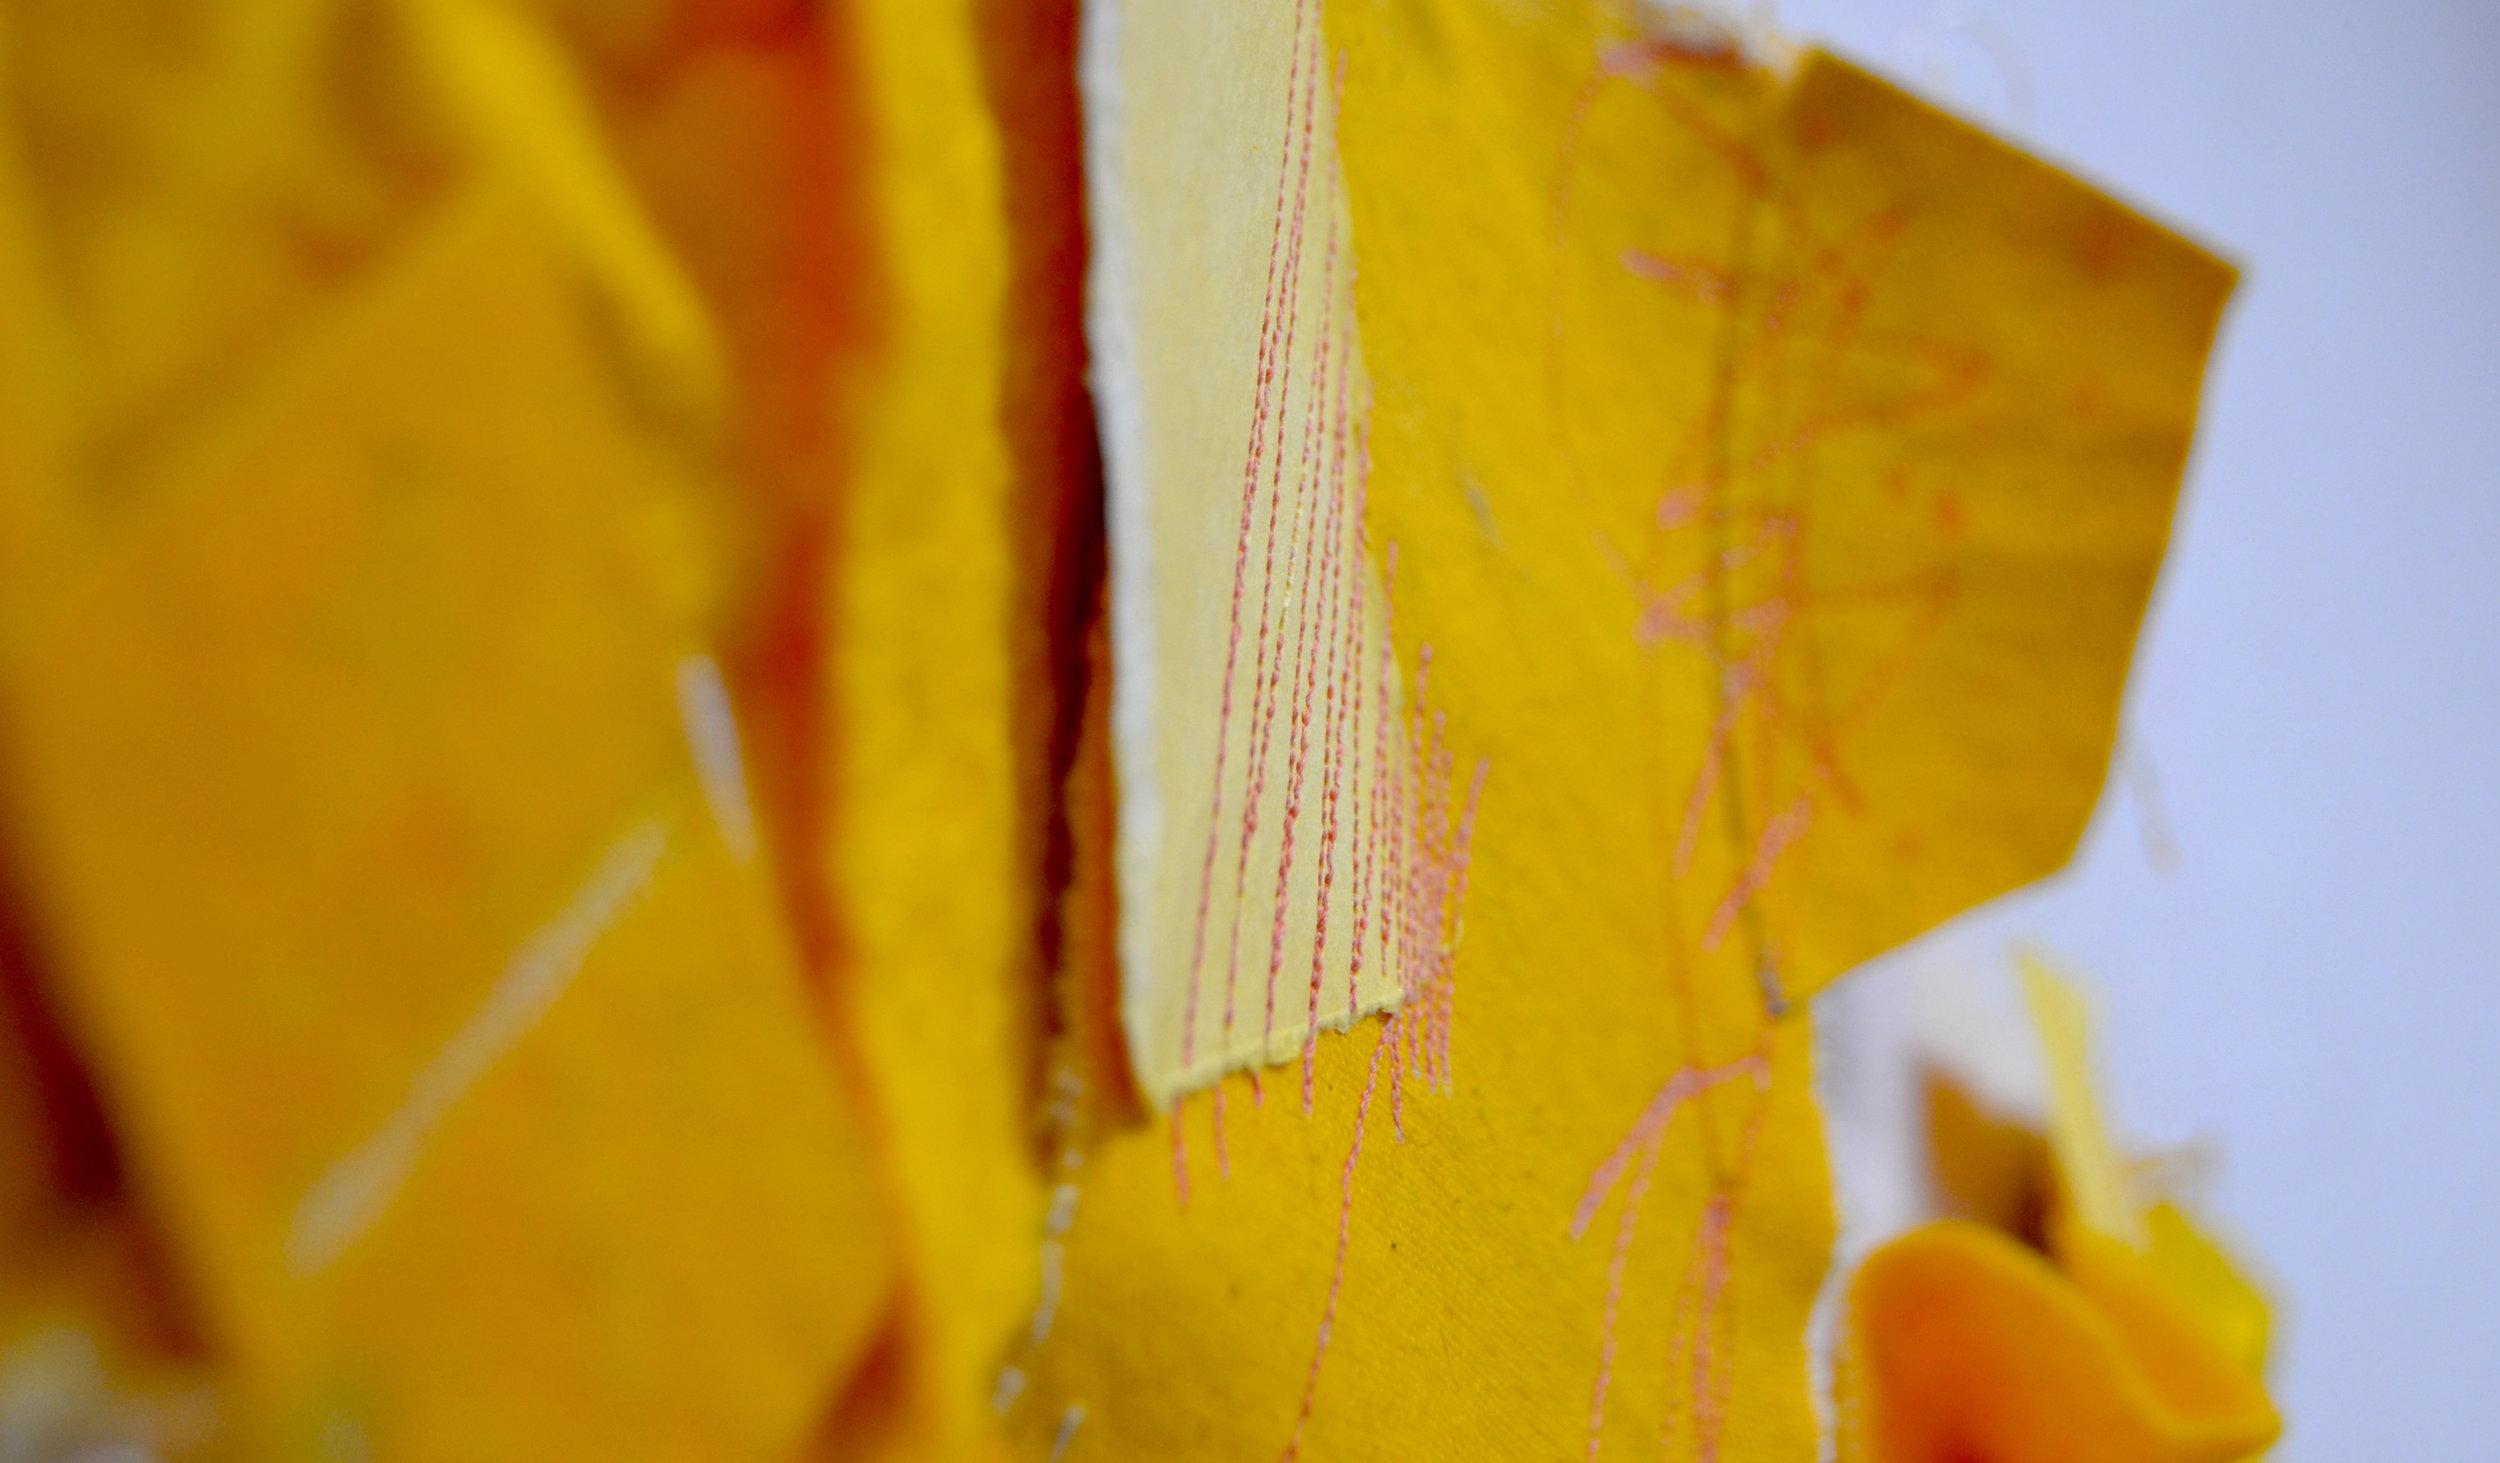 aliana grace bailey_yellow 23.jpeg